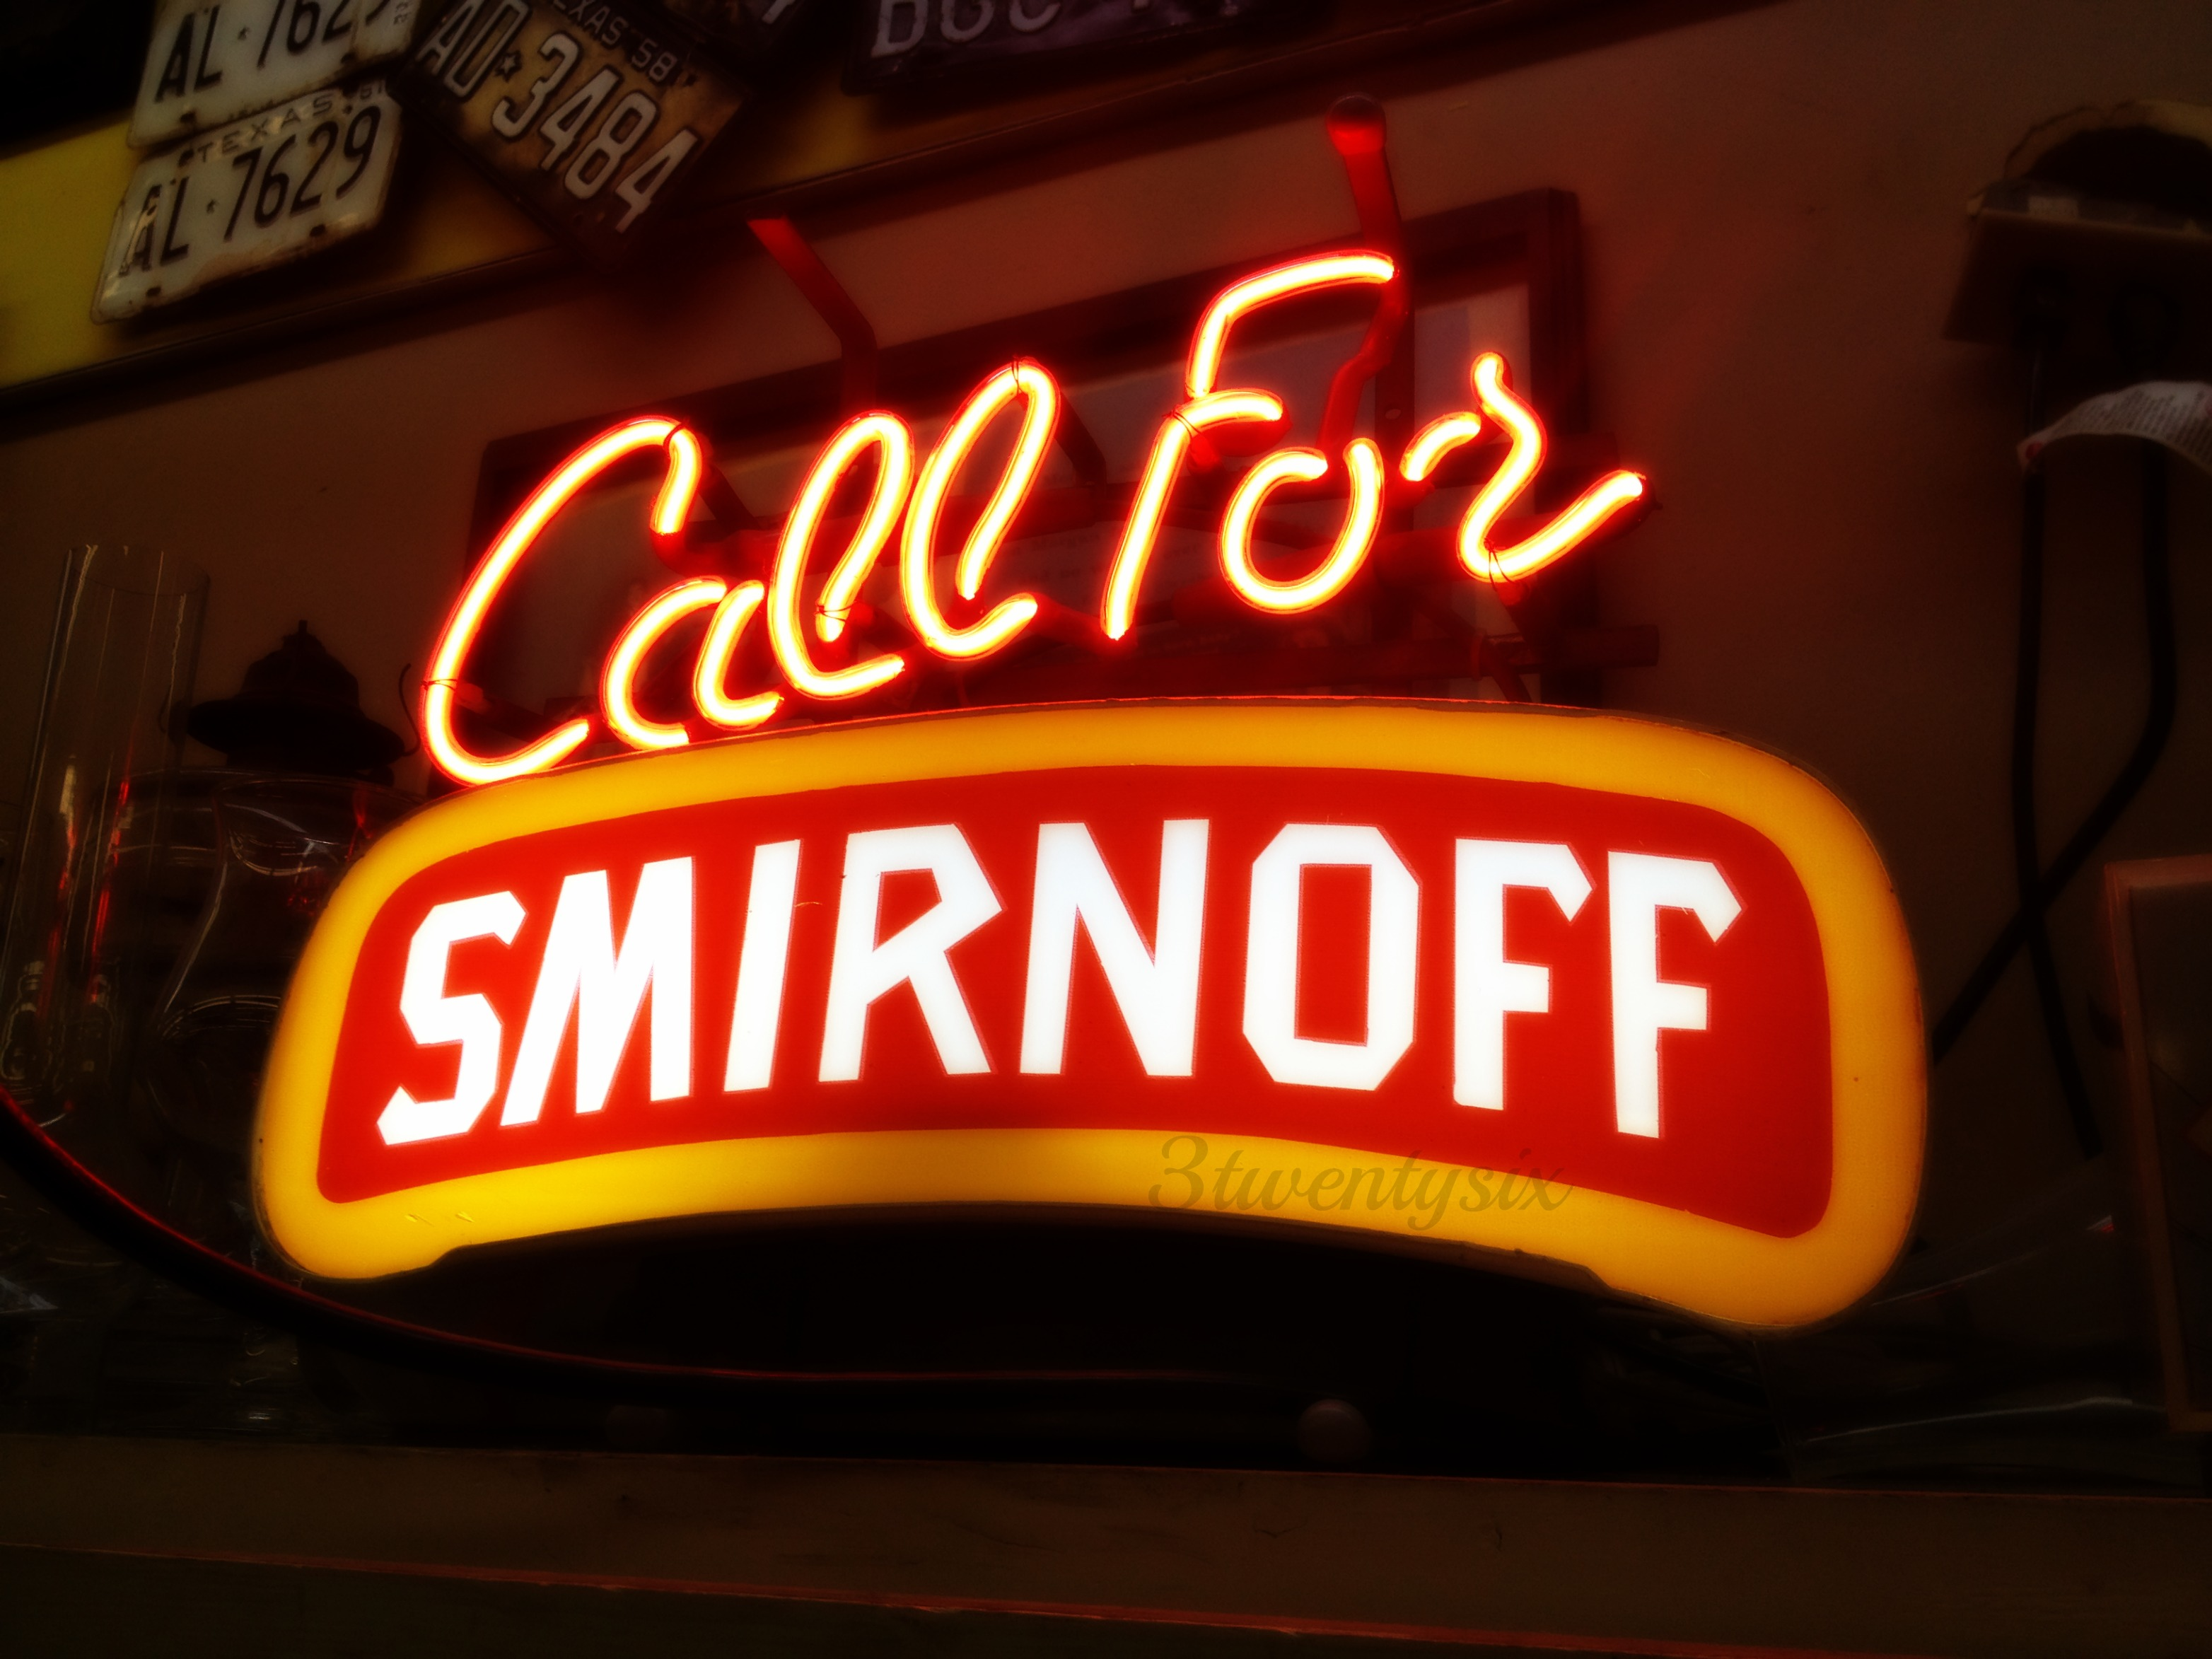 Call For Smirnoff